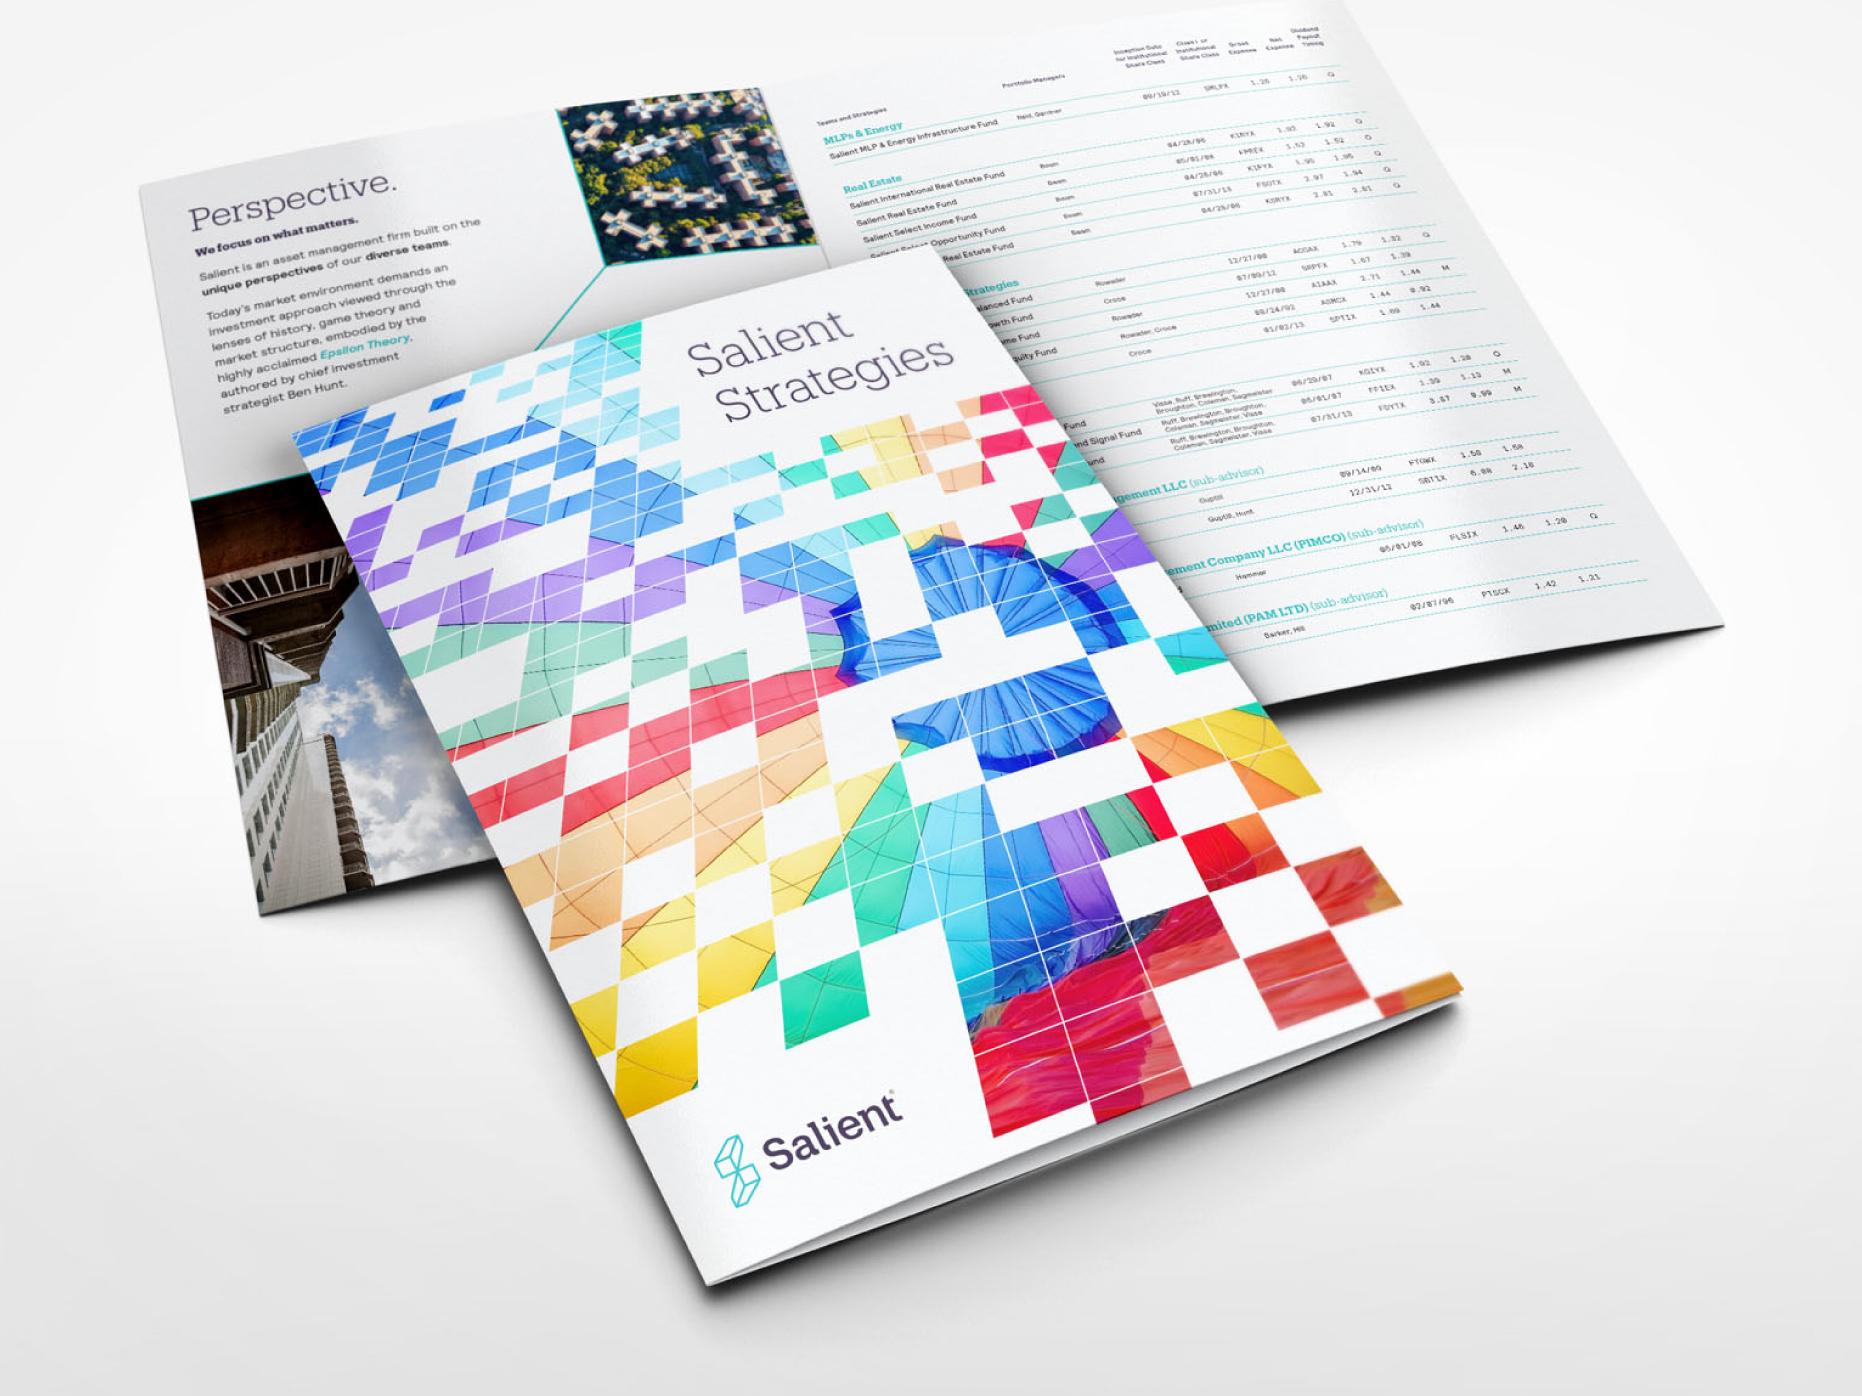 Salient salient strategies print v11